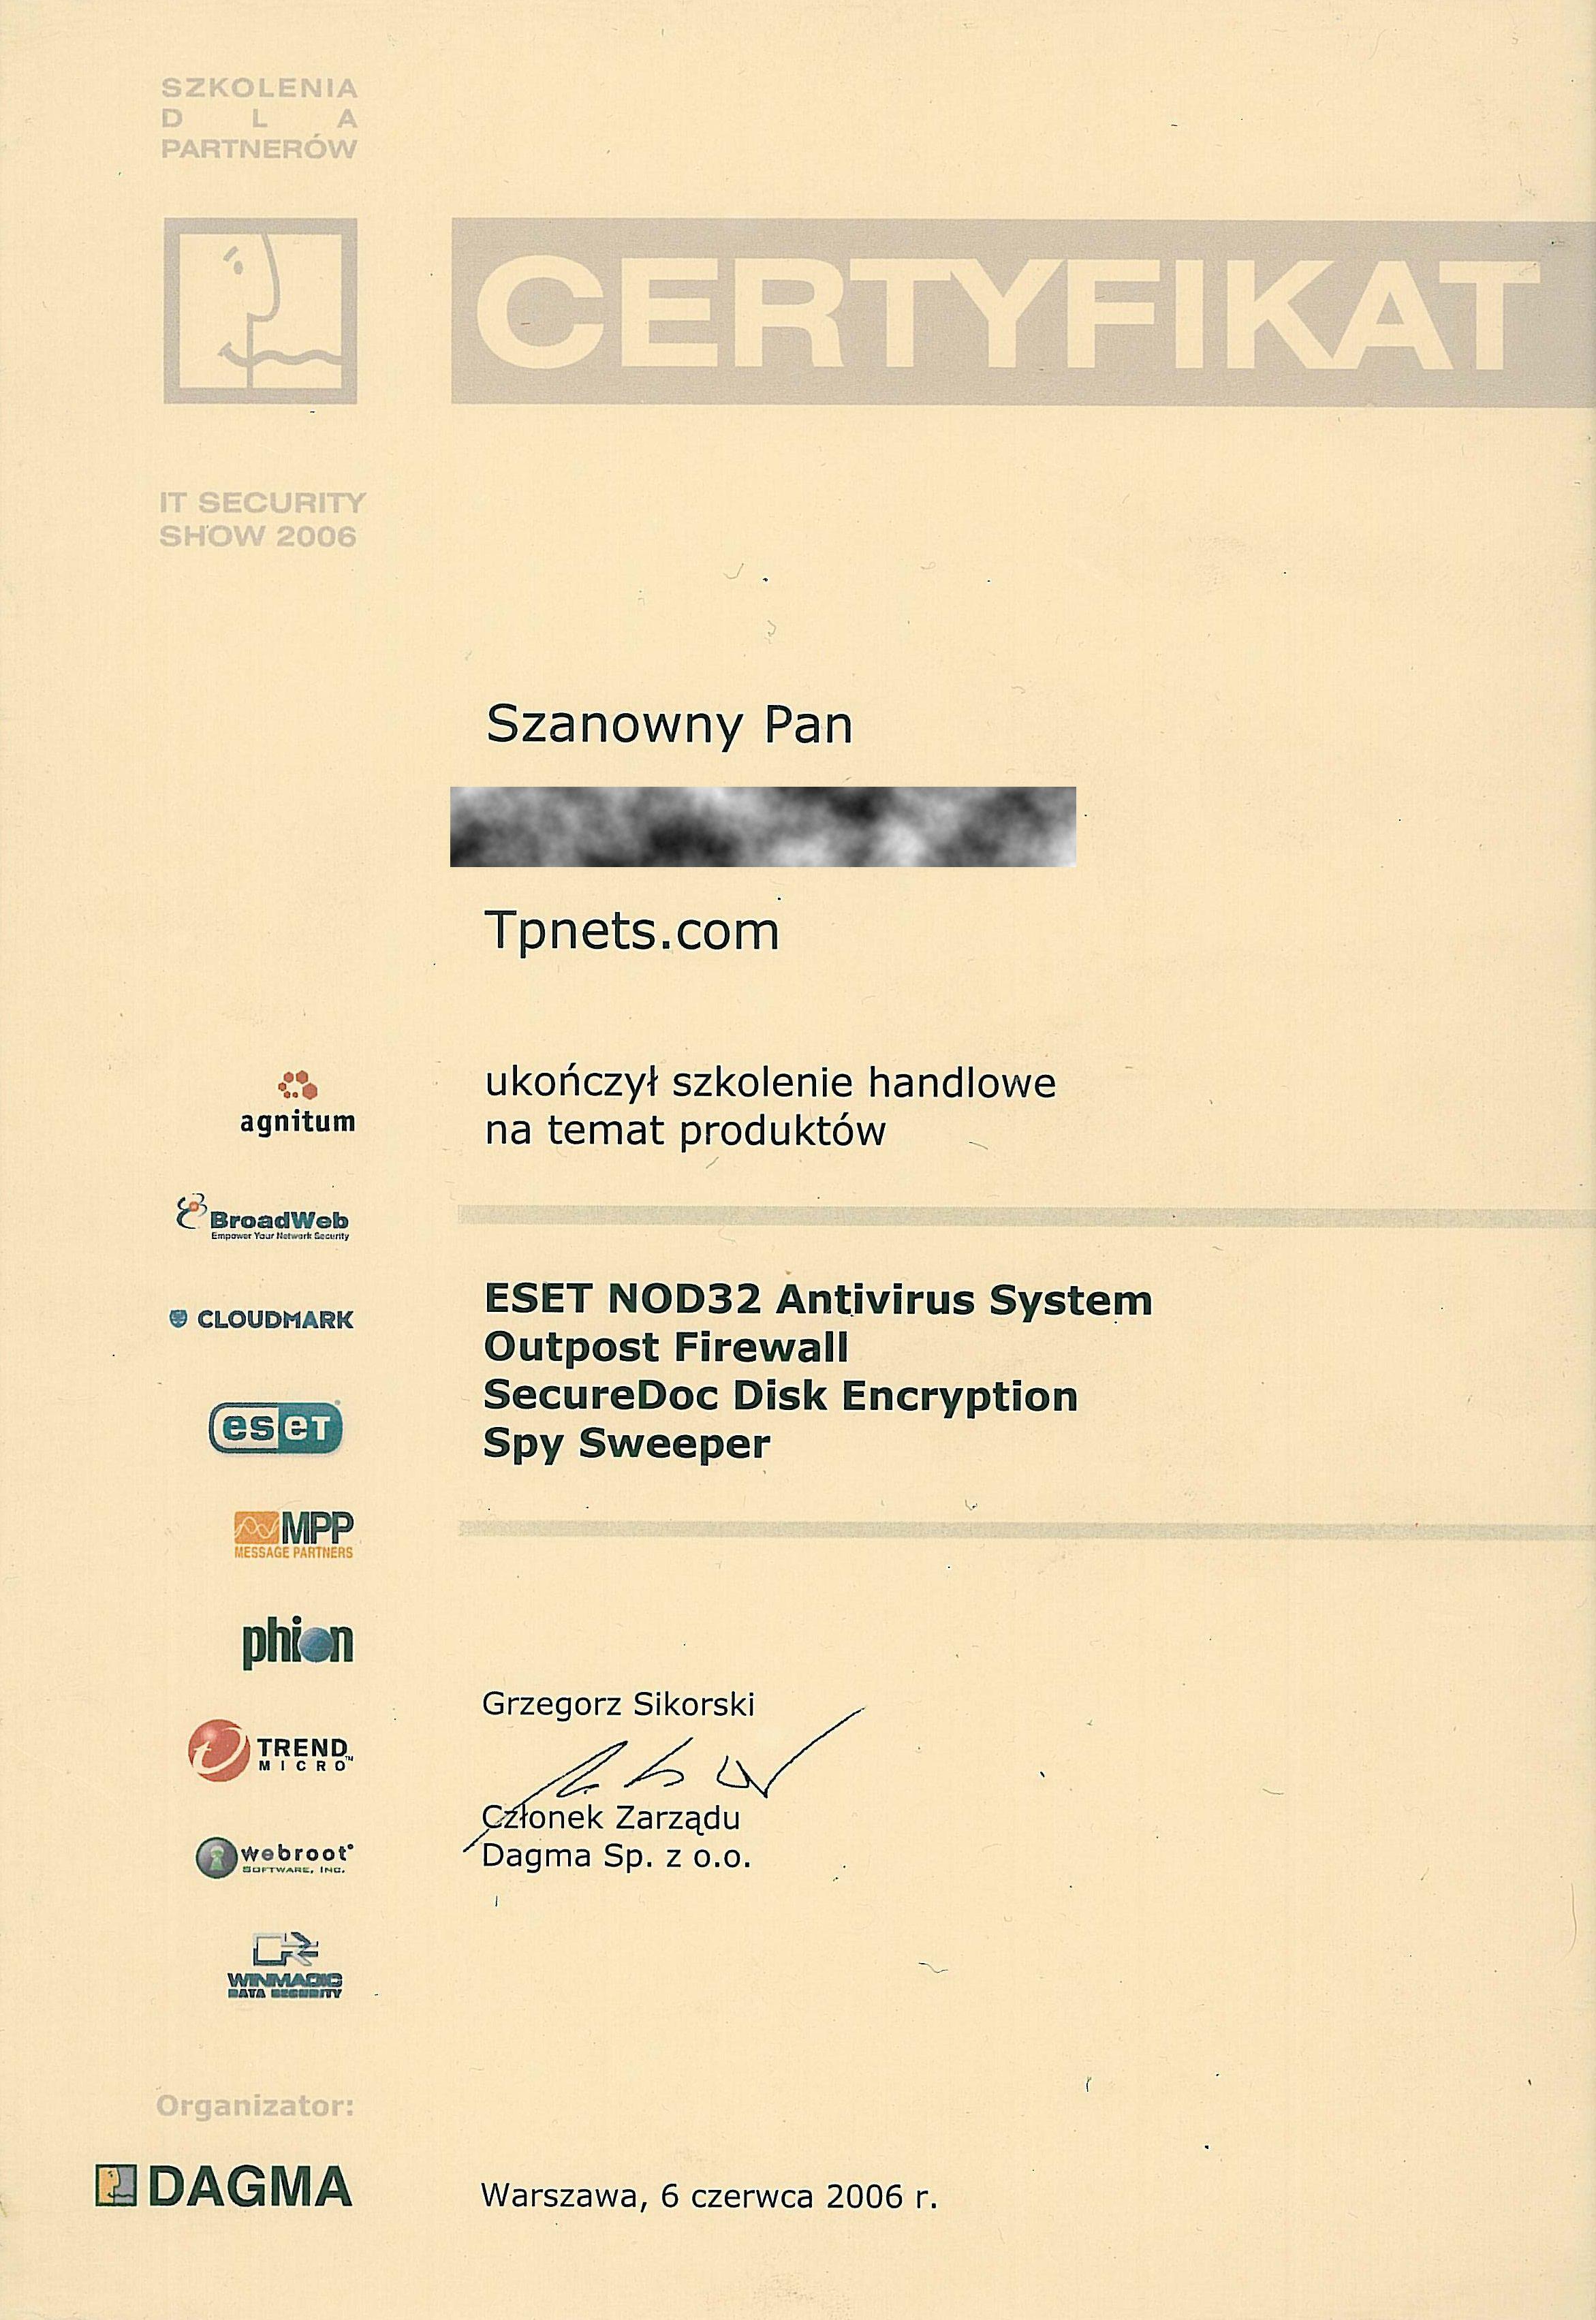 dagma_2006_gp_certyfikat_RODO